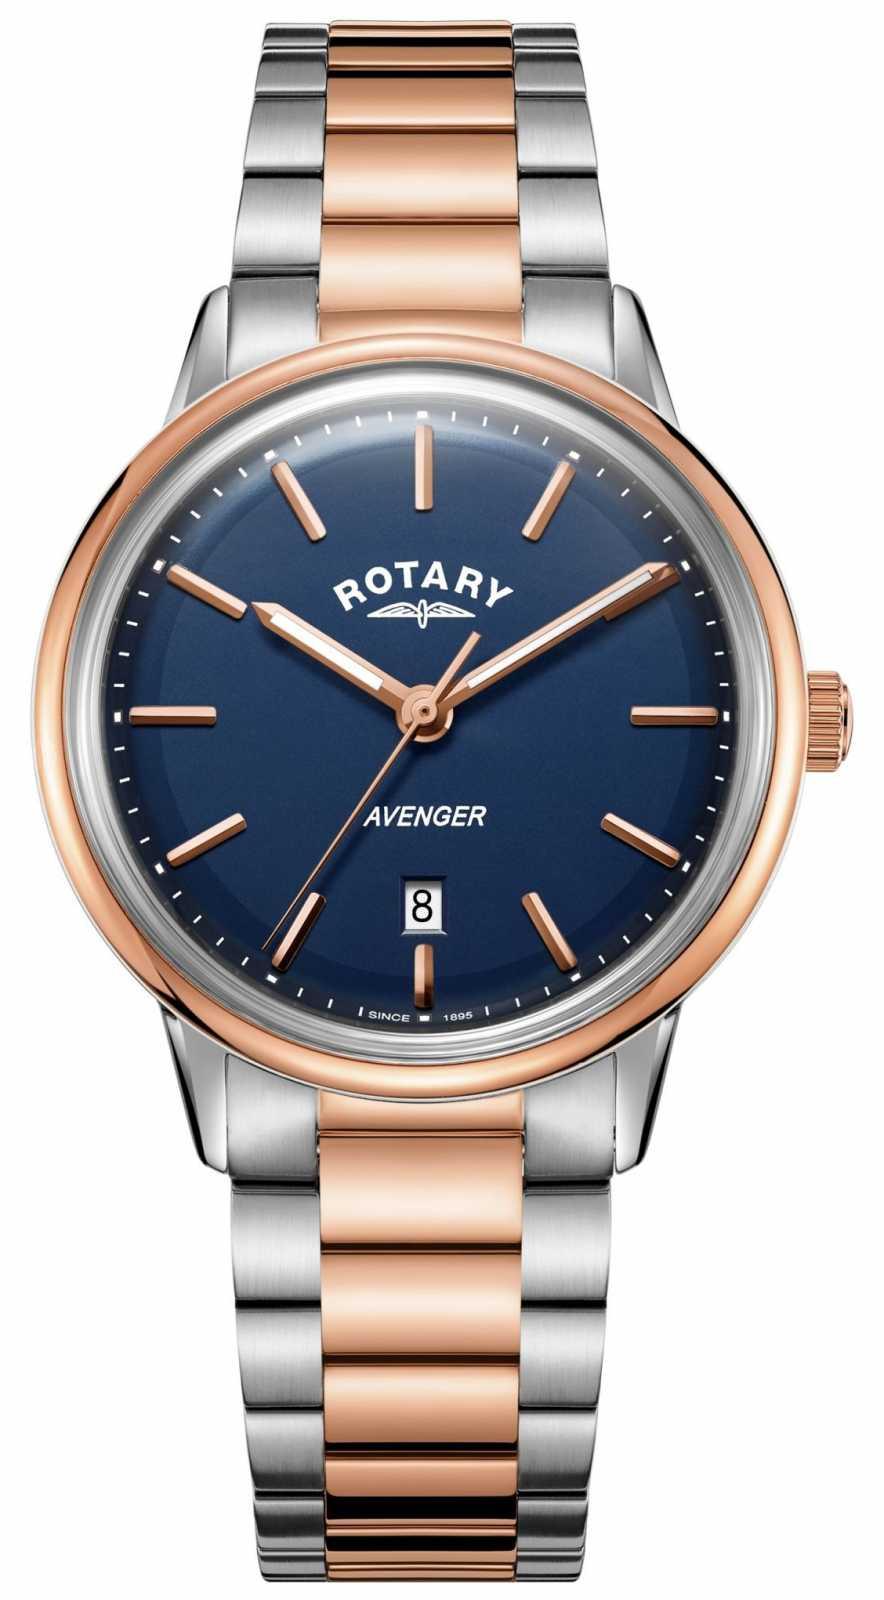 Rotary Mens Avenger Watch | Stainless Steel Bracelet | Blue Dial | GB05342/05